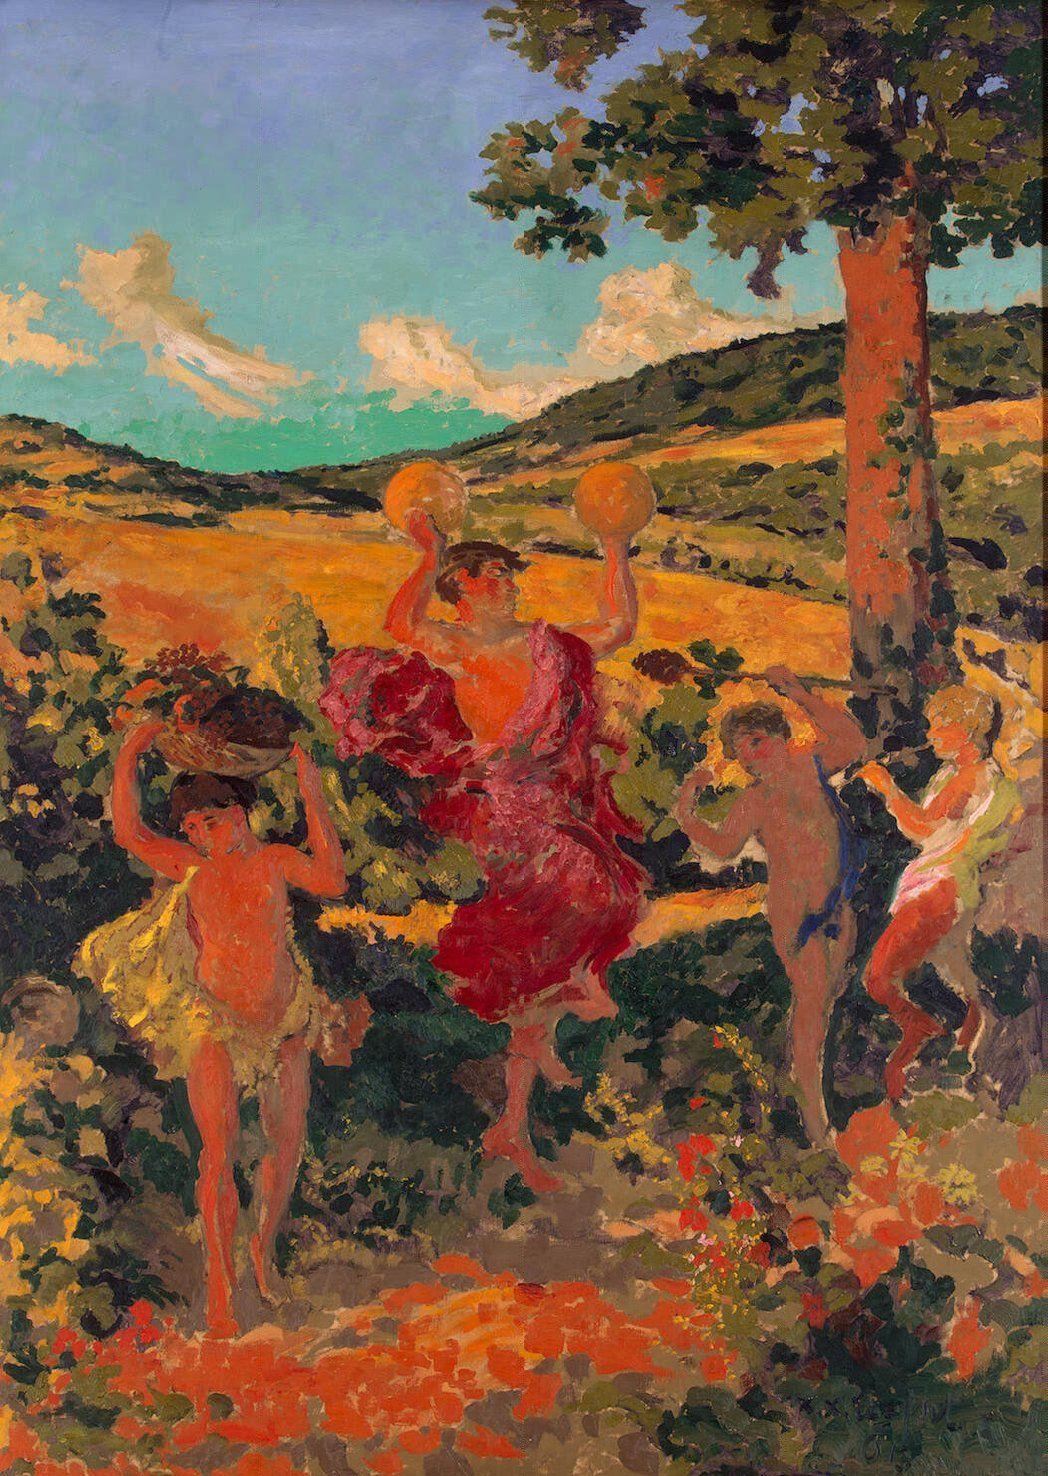 Rural Festival Painting by Roussel Ker Xavier | Oil Painting